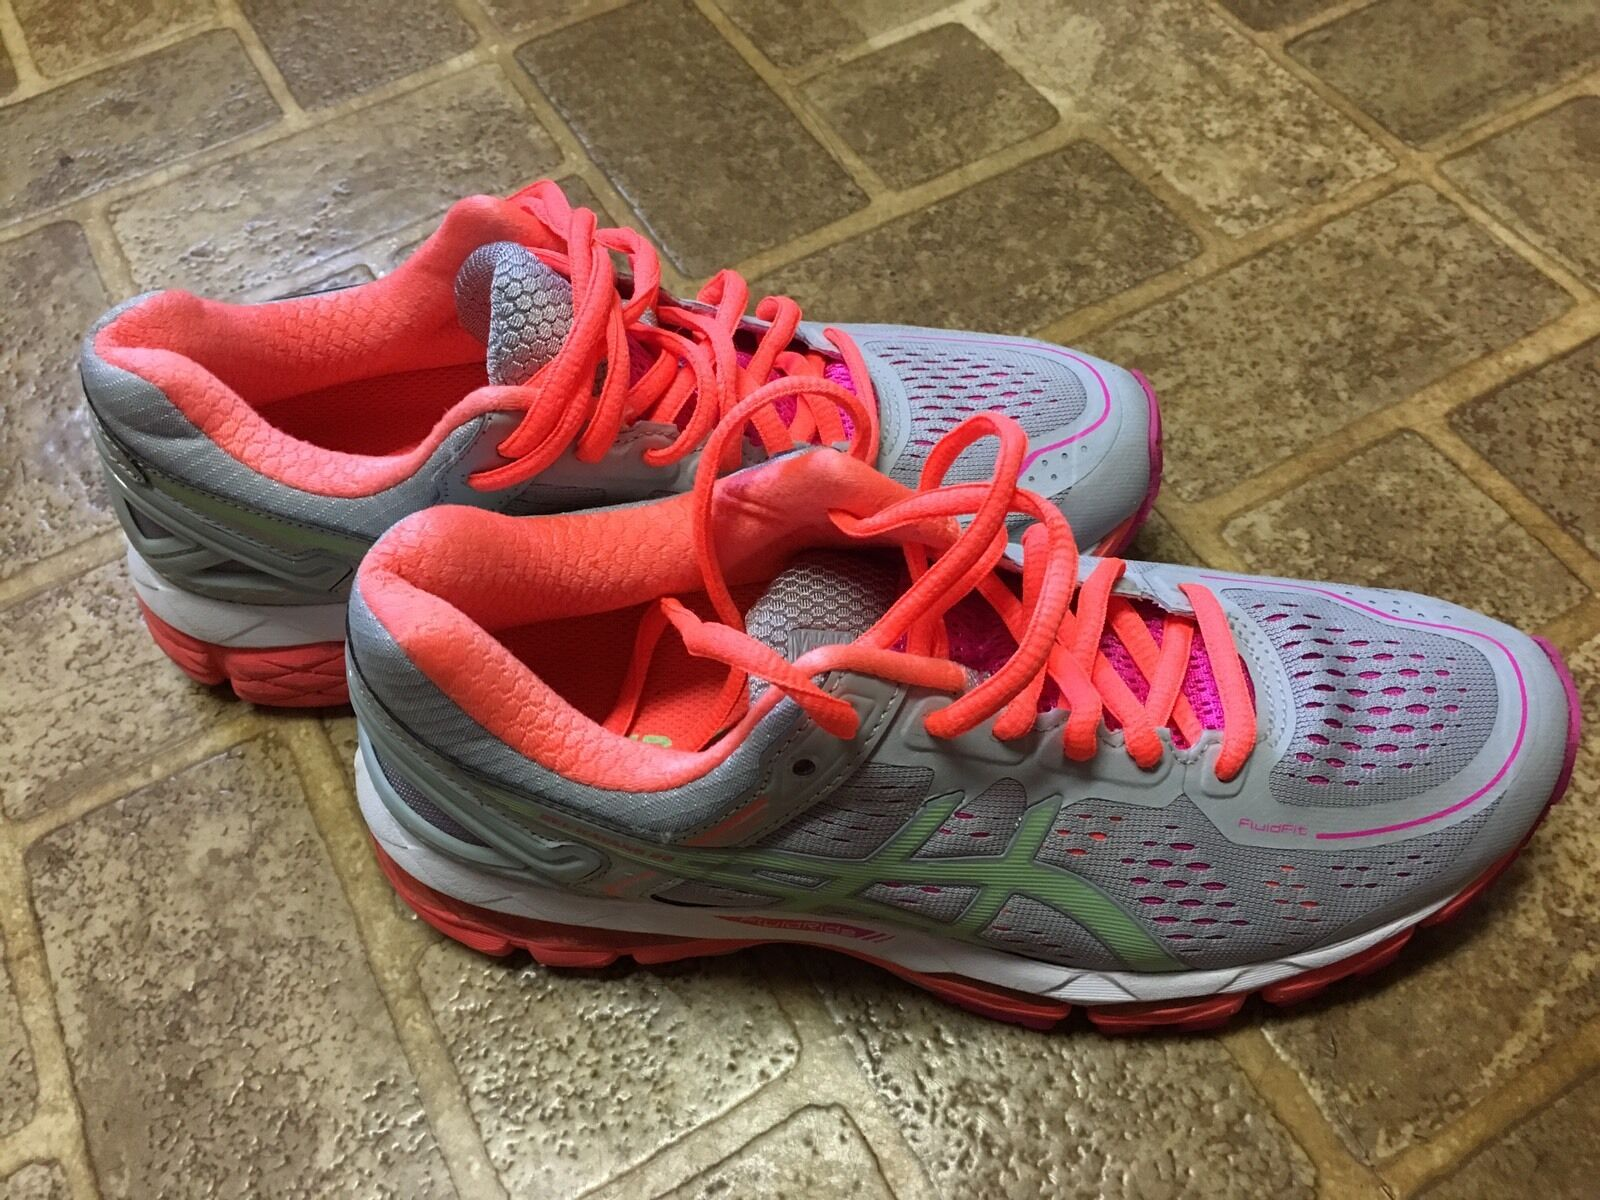 EUC Women's Asics Kayano 22  Running Shoes Comfortable Seasonal clearance sale